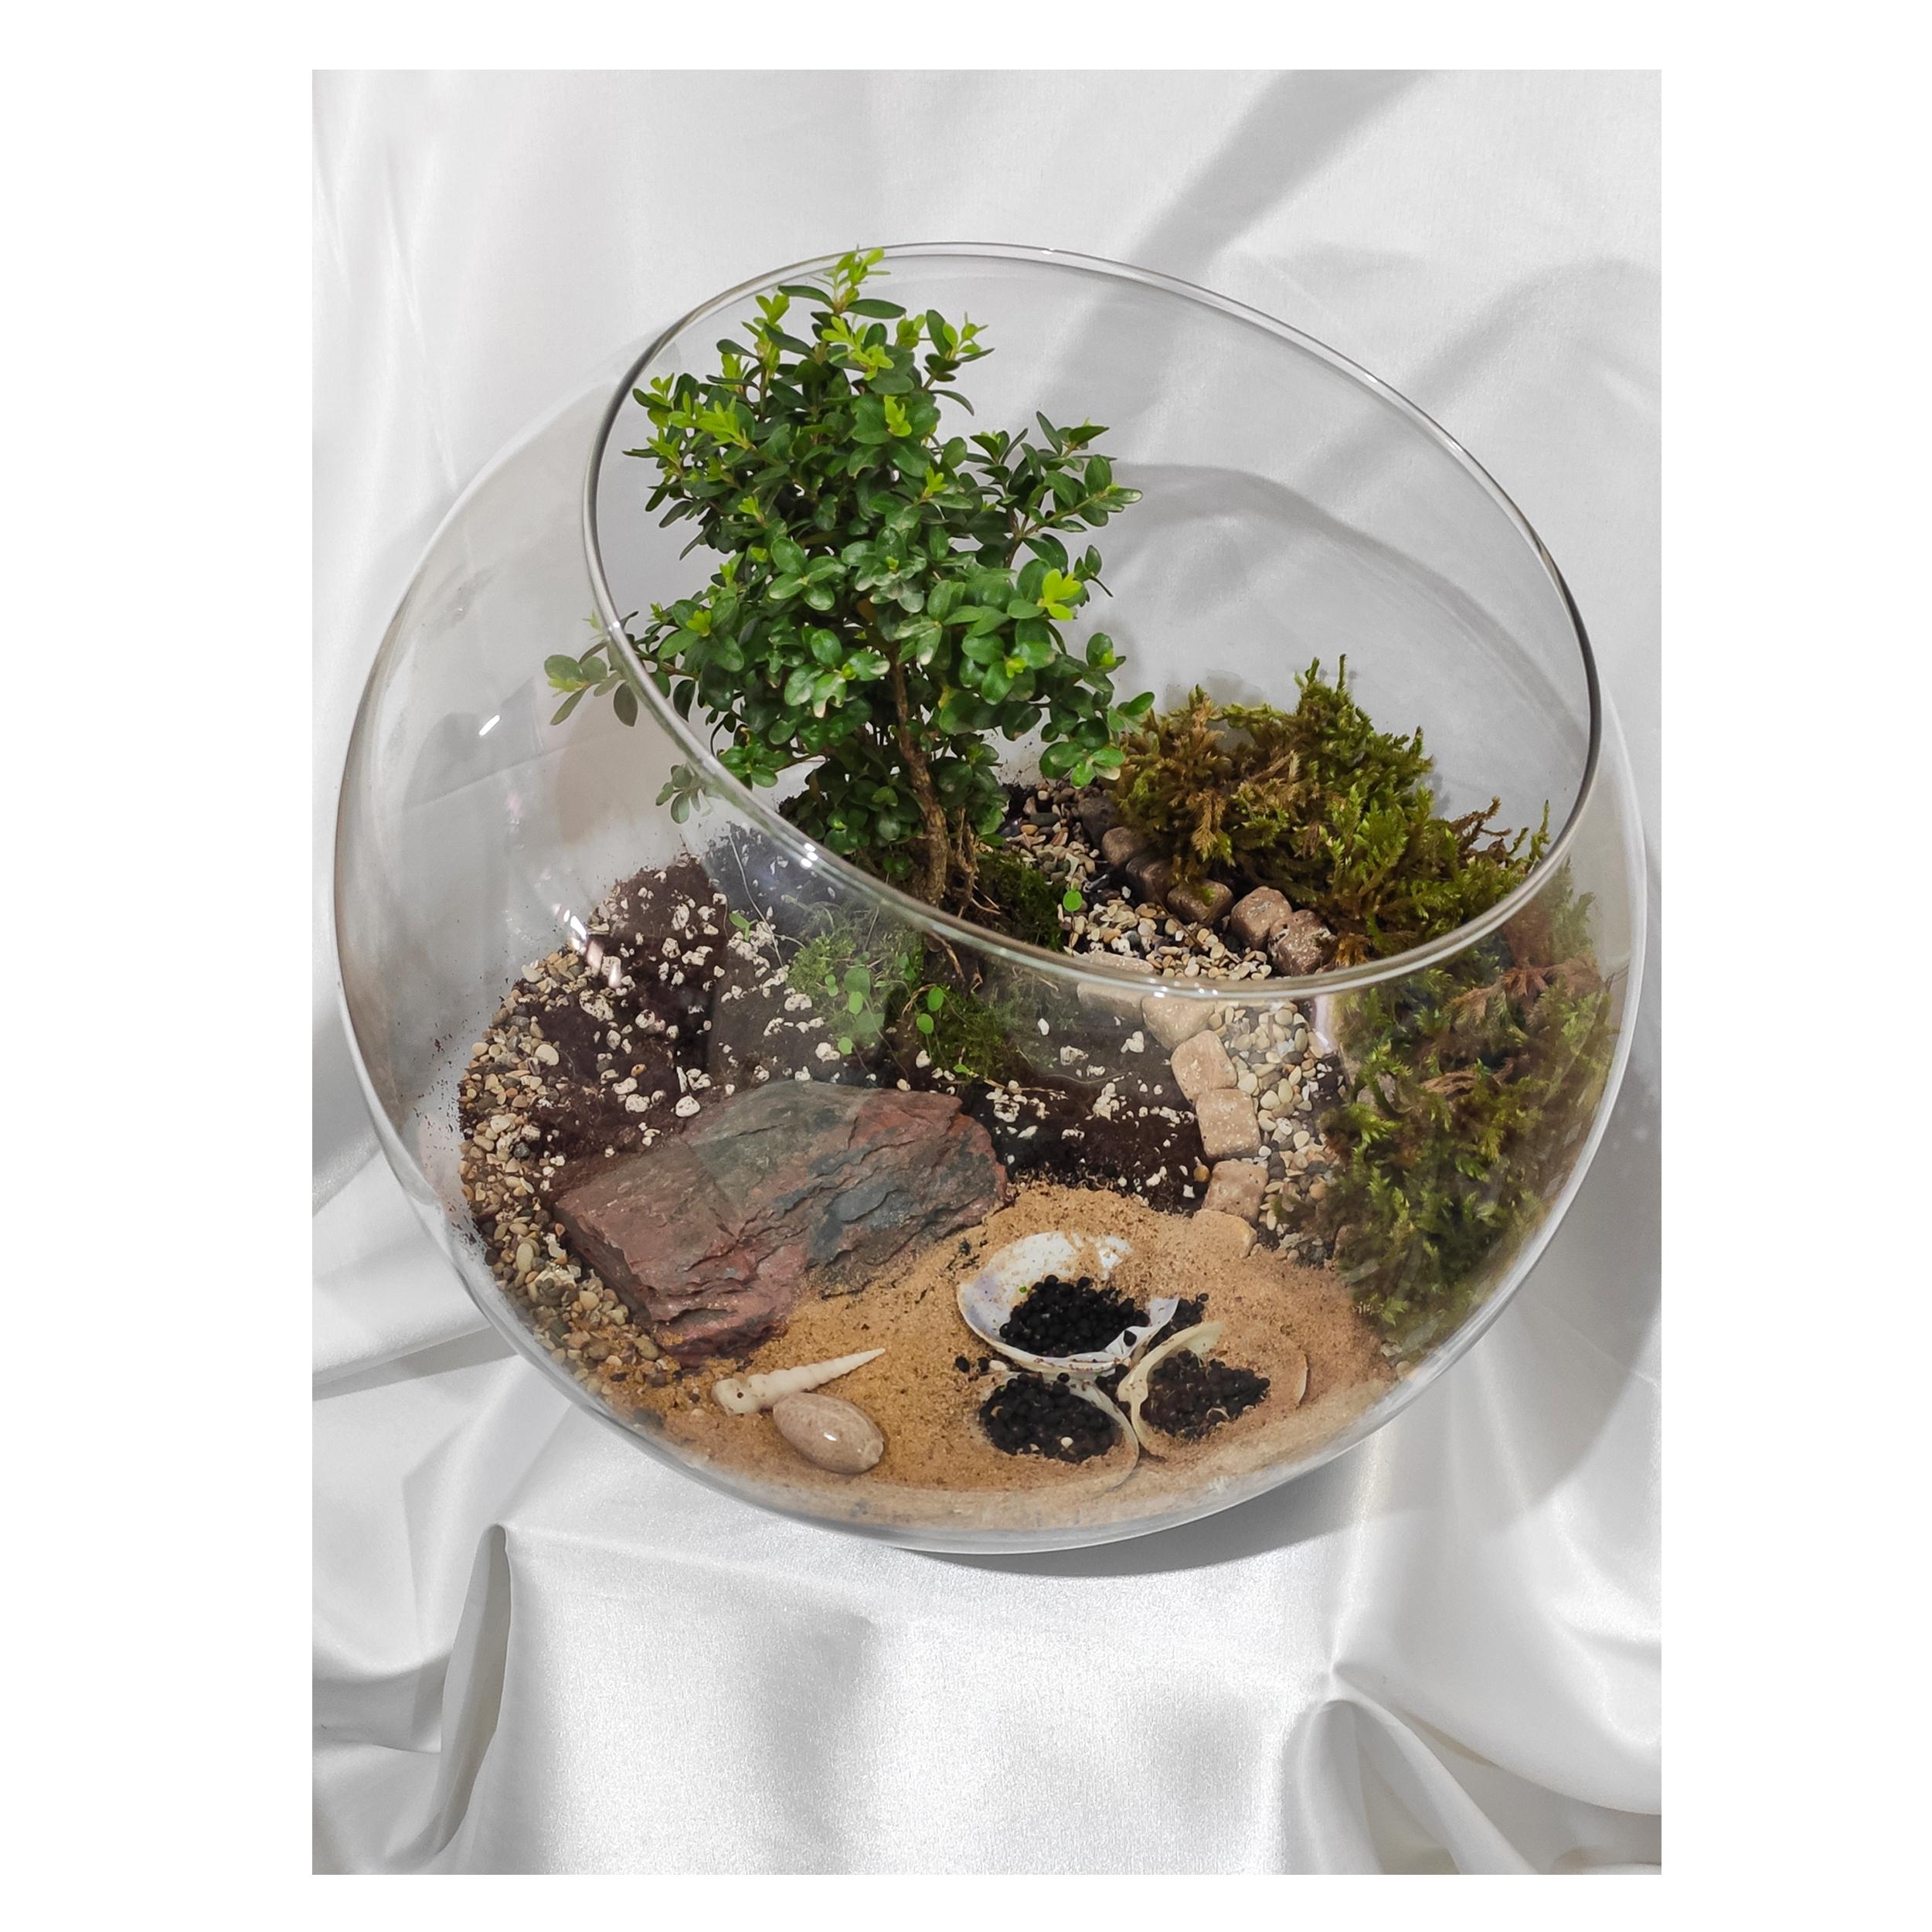 تراریوم گیاه طبیعی کد Kore-sml28 main 1 1